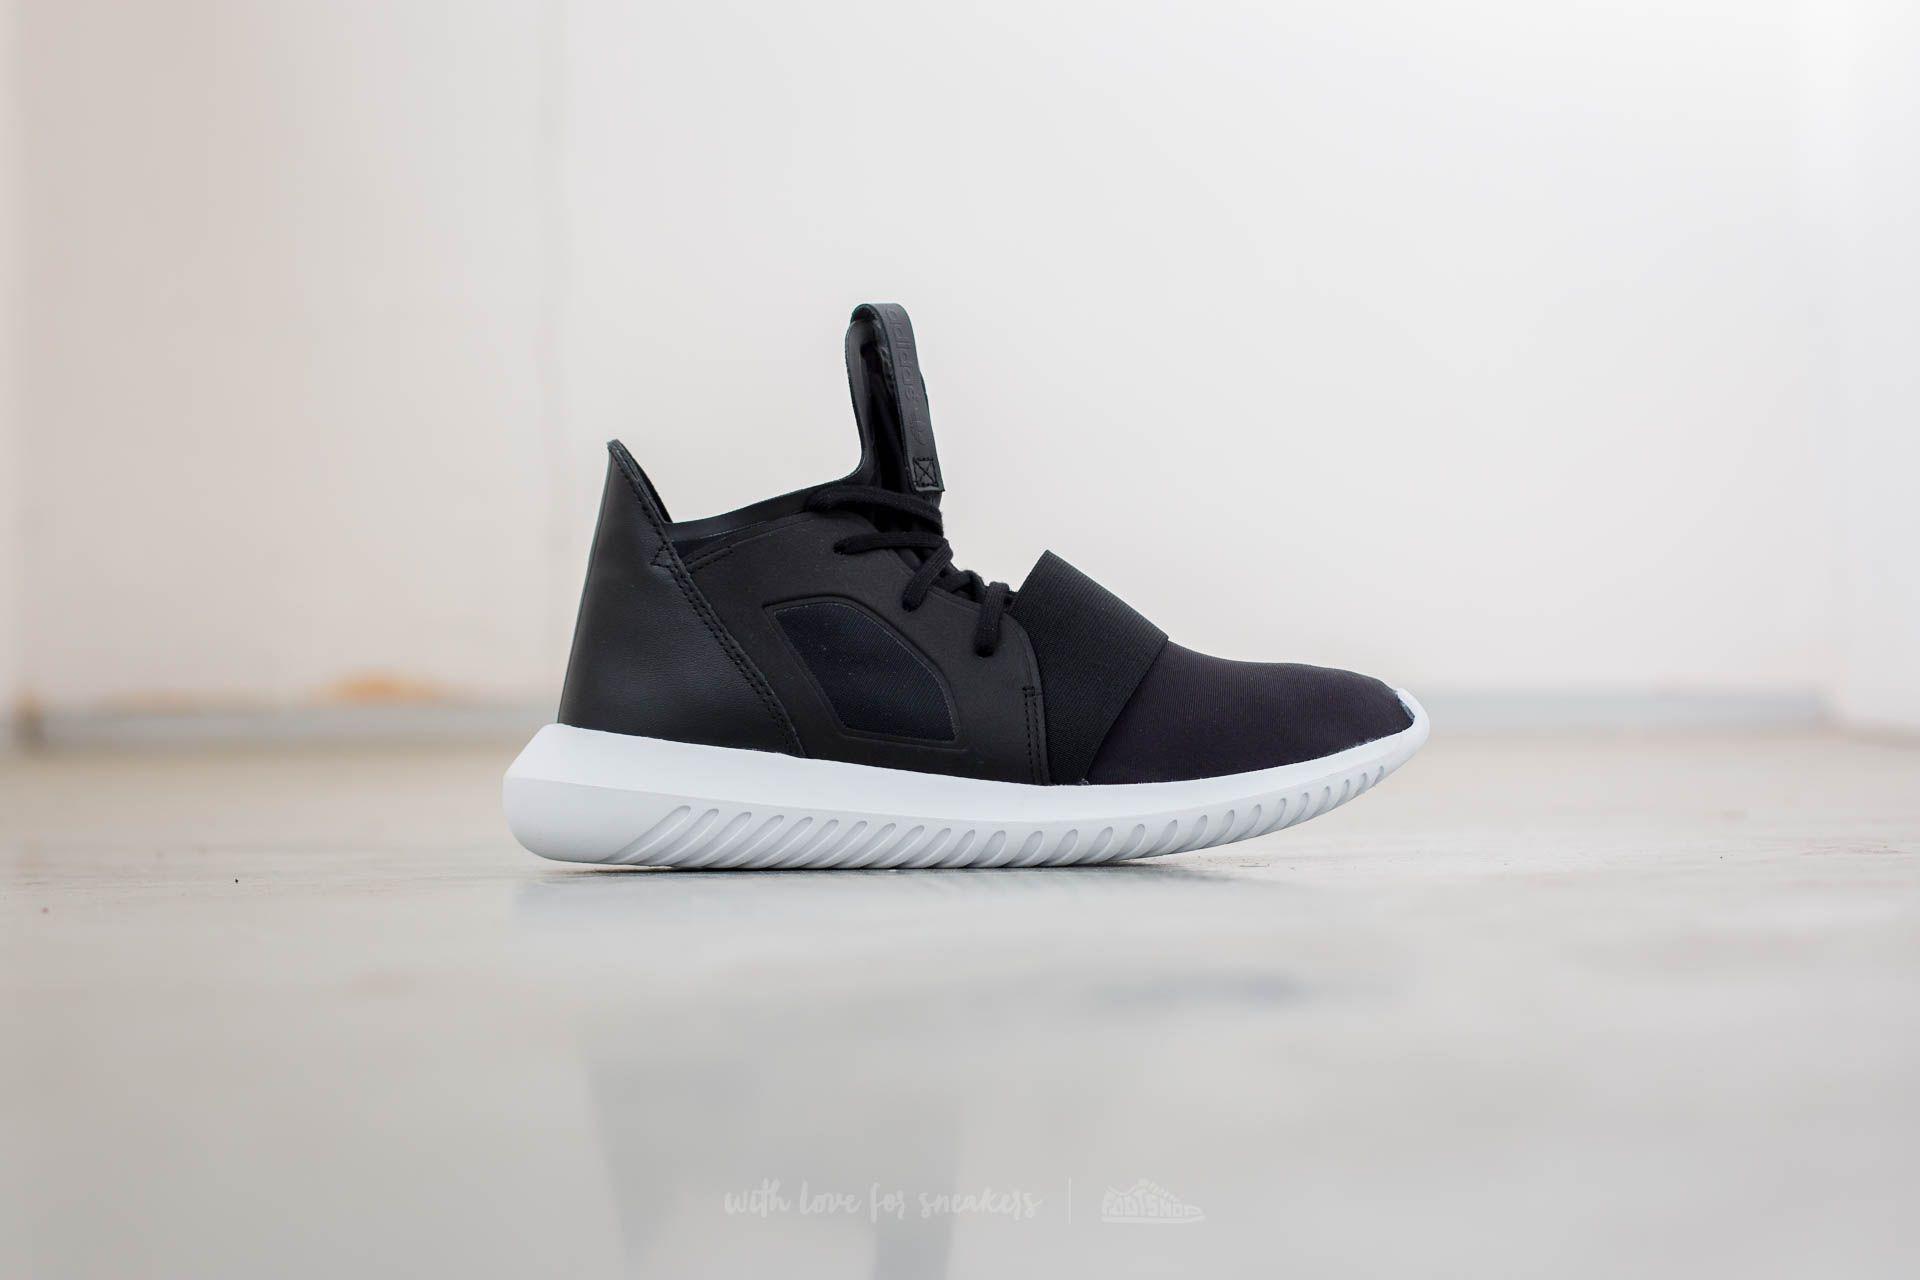 competitive price c6c9f d93a4 Lyst - adidas Originals Adidas Tubular Defiant W Core Black  Core ...